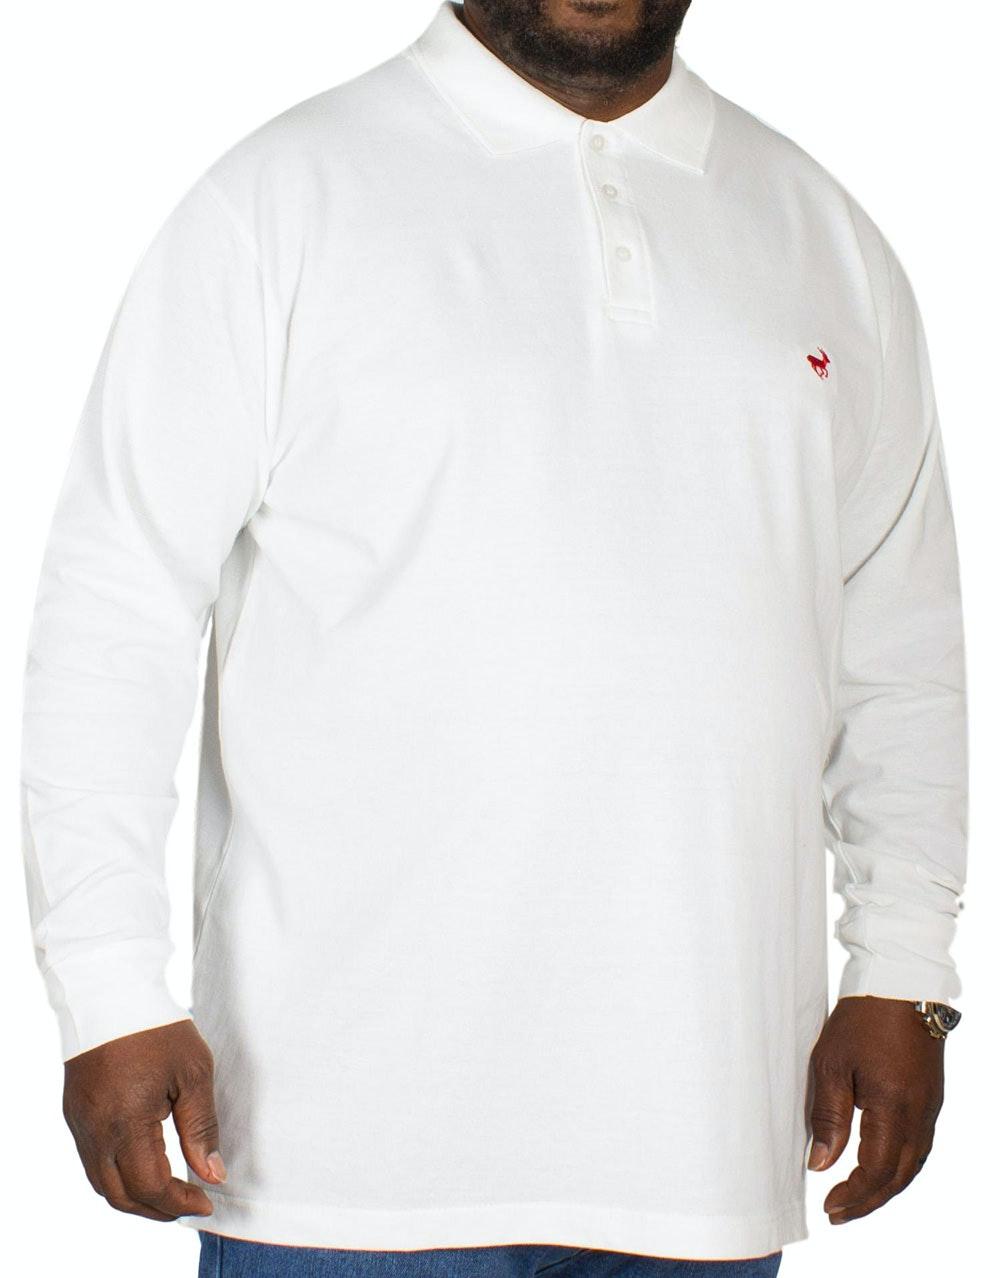 Bigdude Embroidered Long Sleeve Polo Shirt White